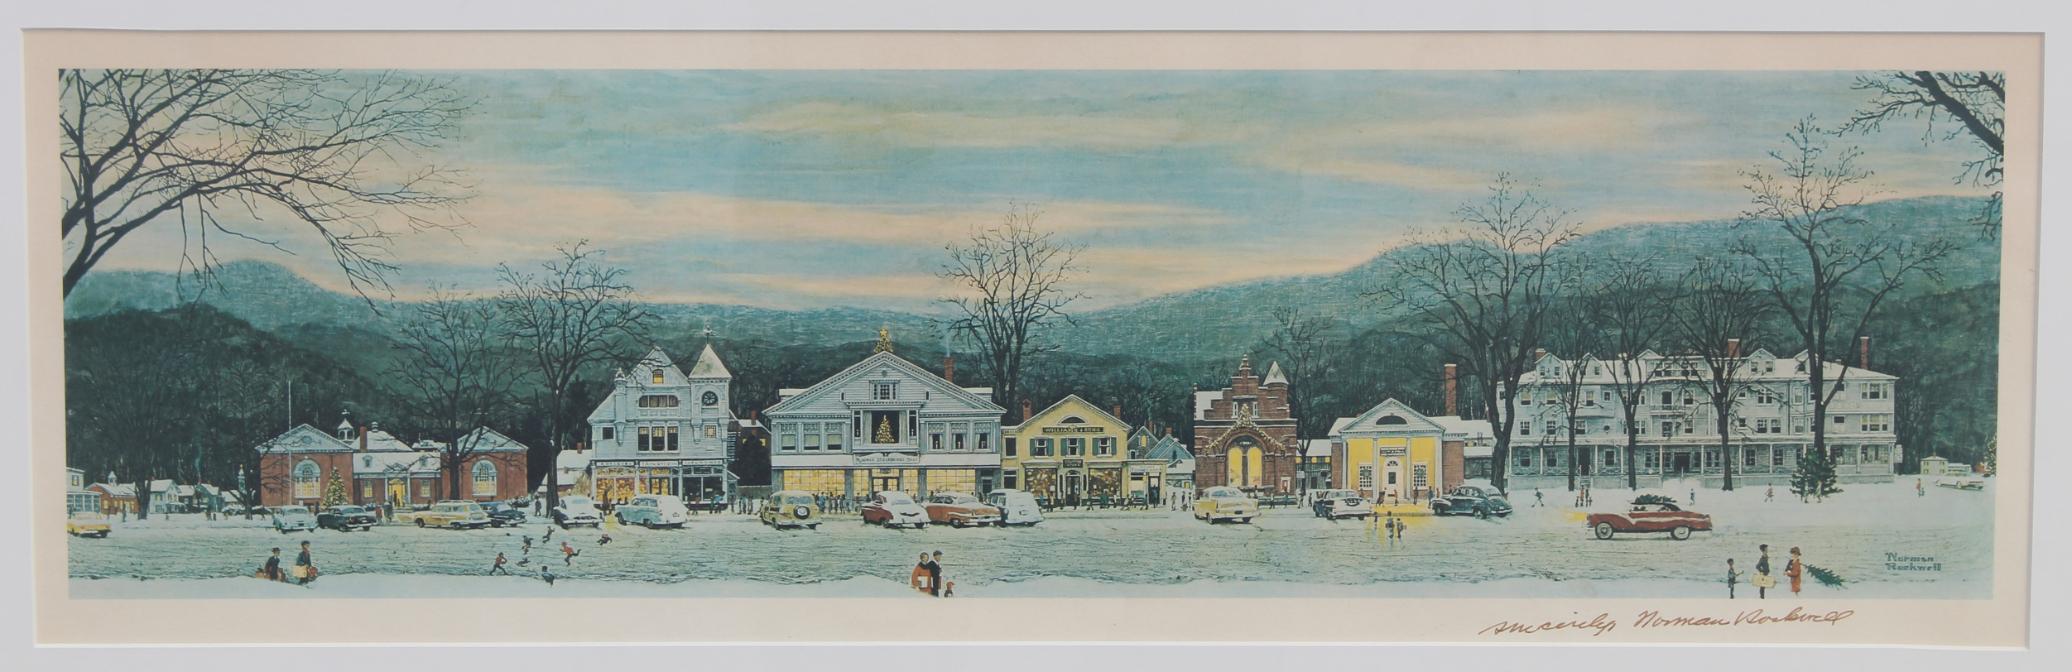 "Norman Rockwell ""Main Street Stockbridge 1967"" - Image 2 of 3"